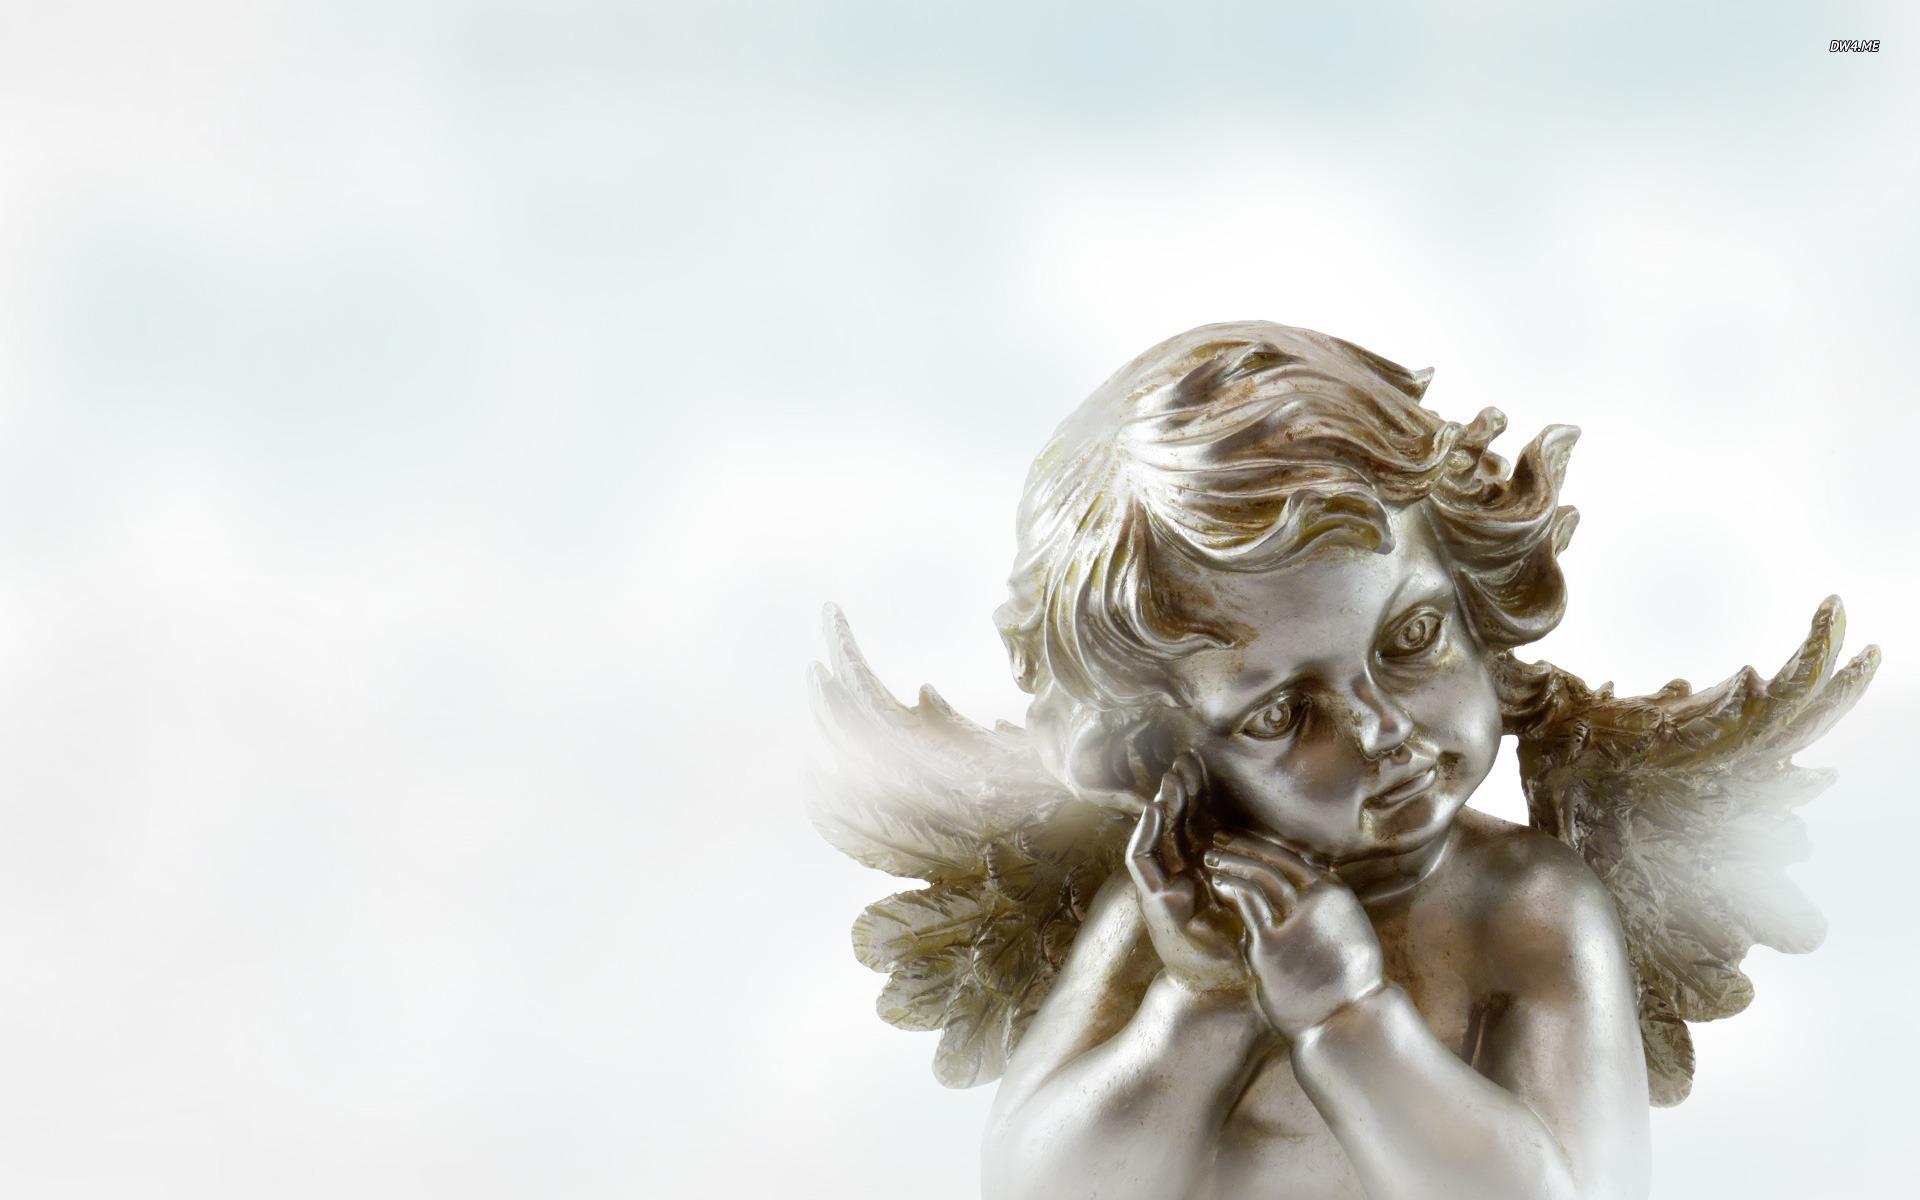 Christmas angel wallpaper 1920x1080 Christmas angel wallpaper 1920x1200